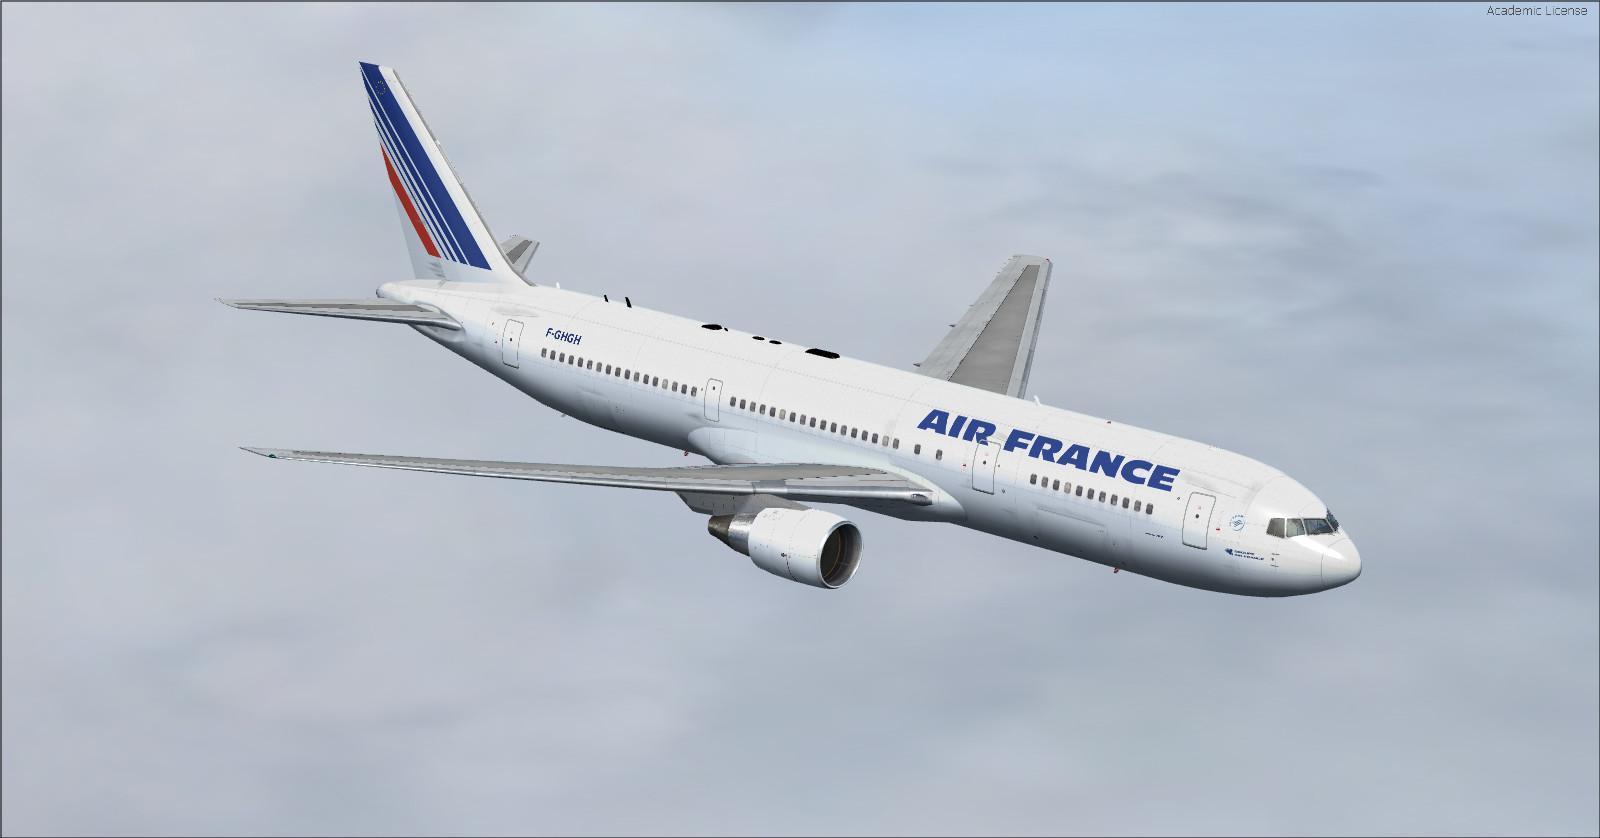 Fsx boeing 767